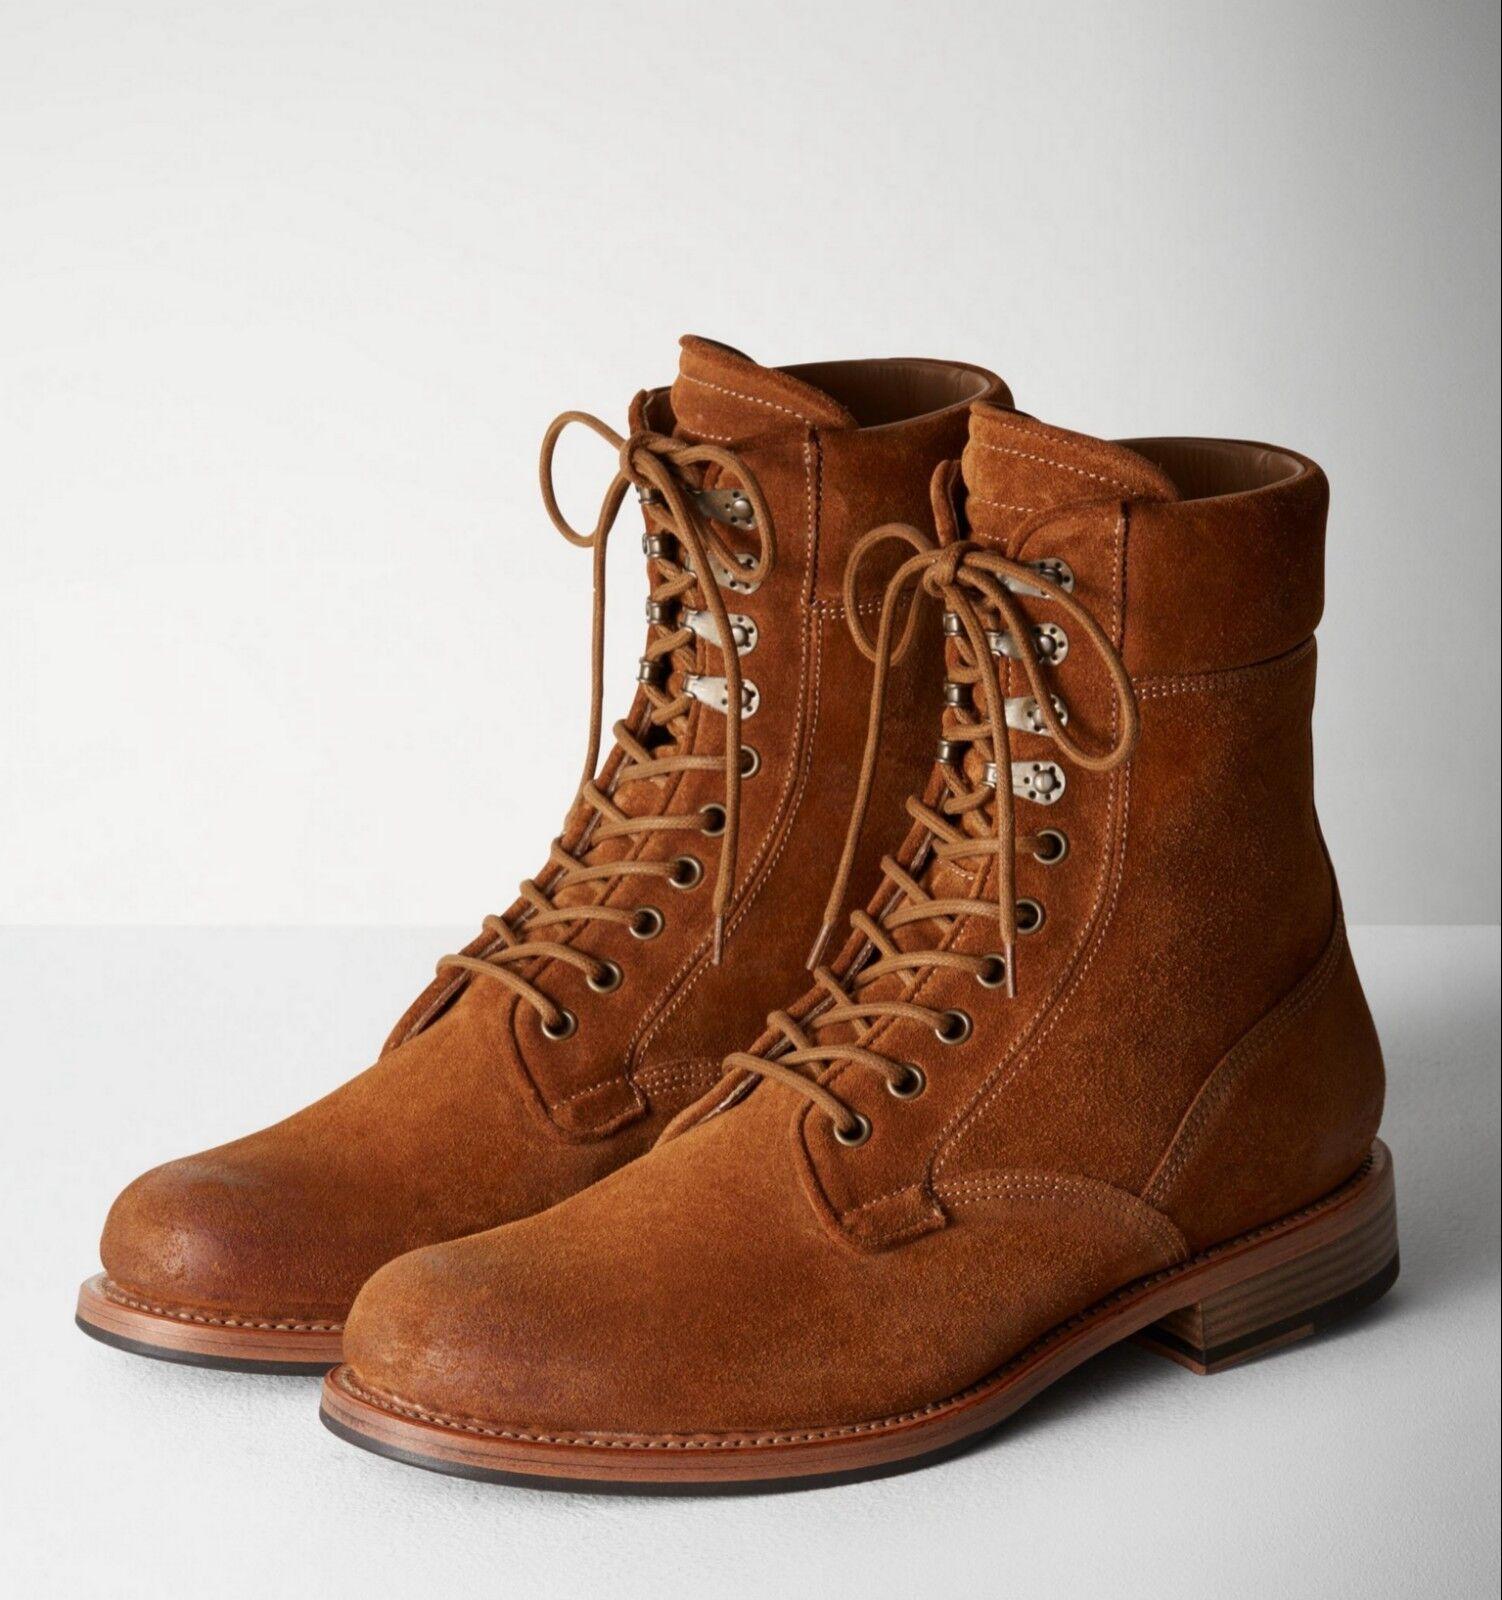 Nuevo Coñac Suede  Rag & Bone   Zapato De Gamuza Spencer Bota Militar